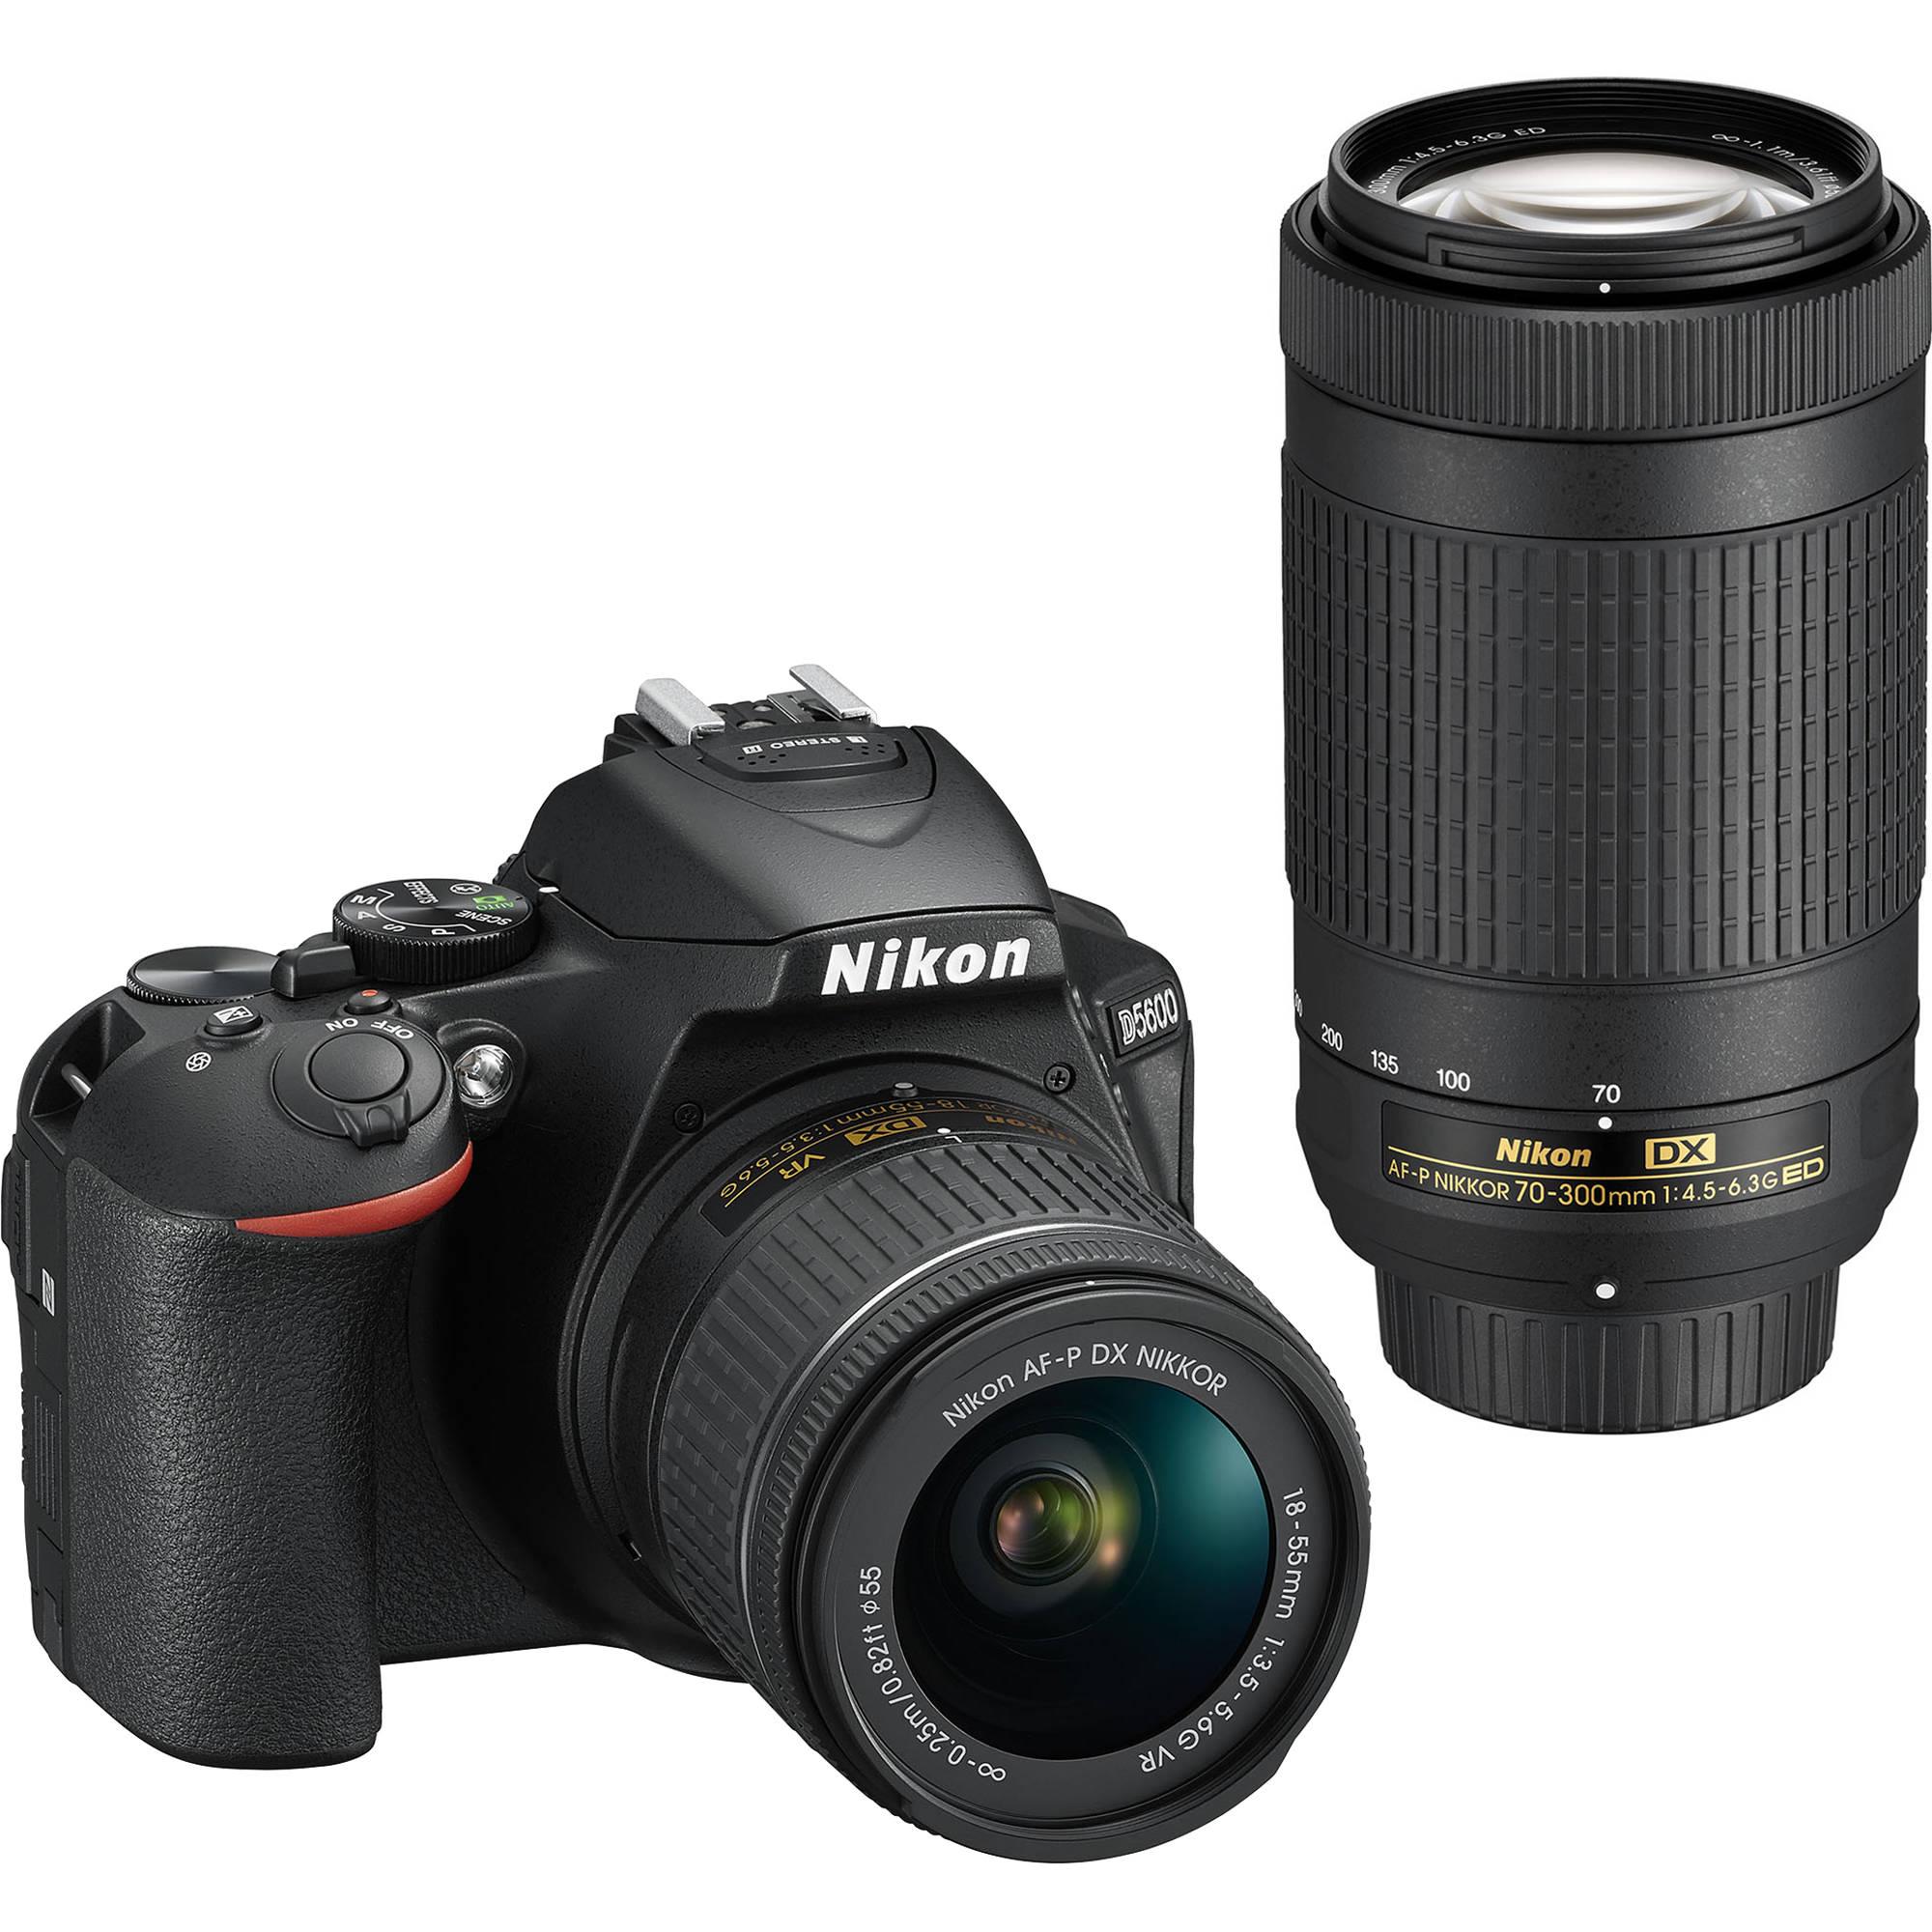 Nikon D5600 Dslr Camera With 18 55mm And 70 300mm Lenses 1580 Nokia 130 Kamera New